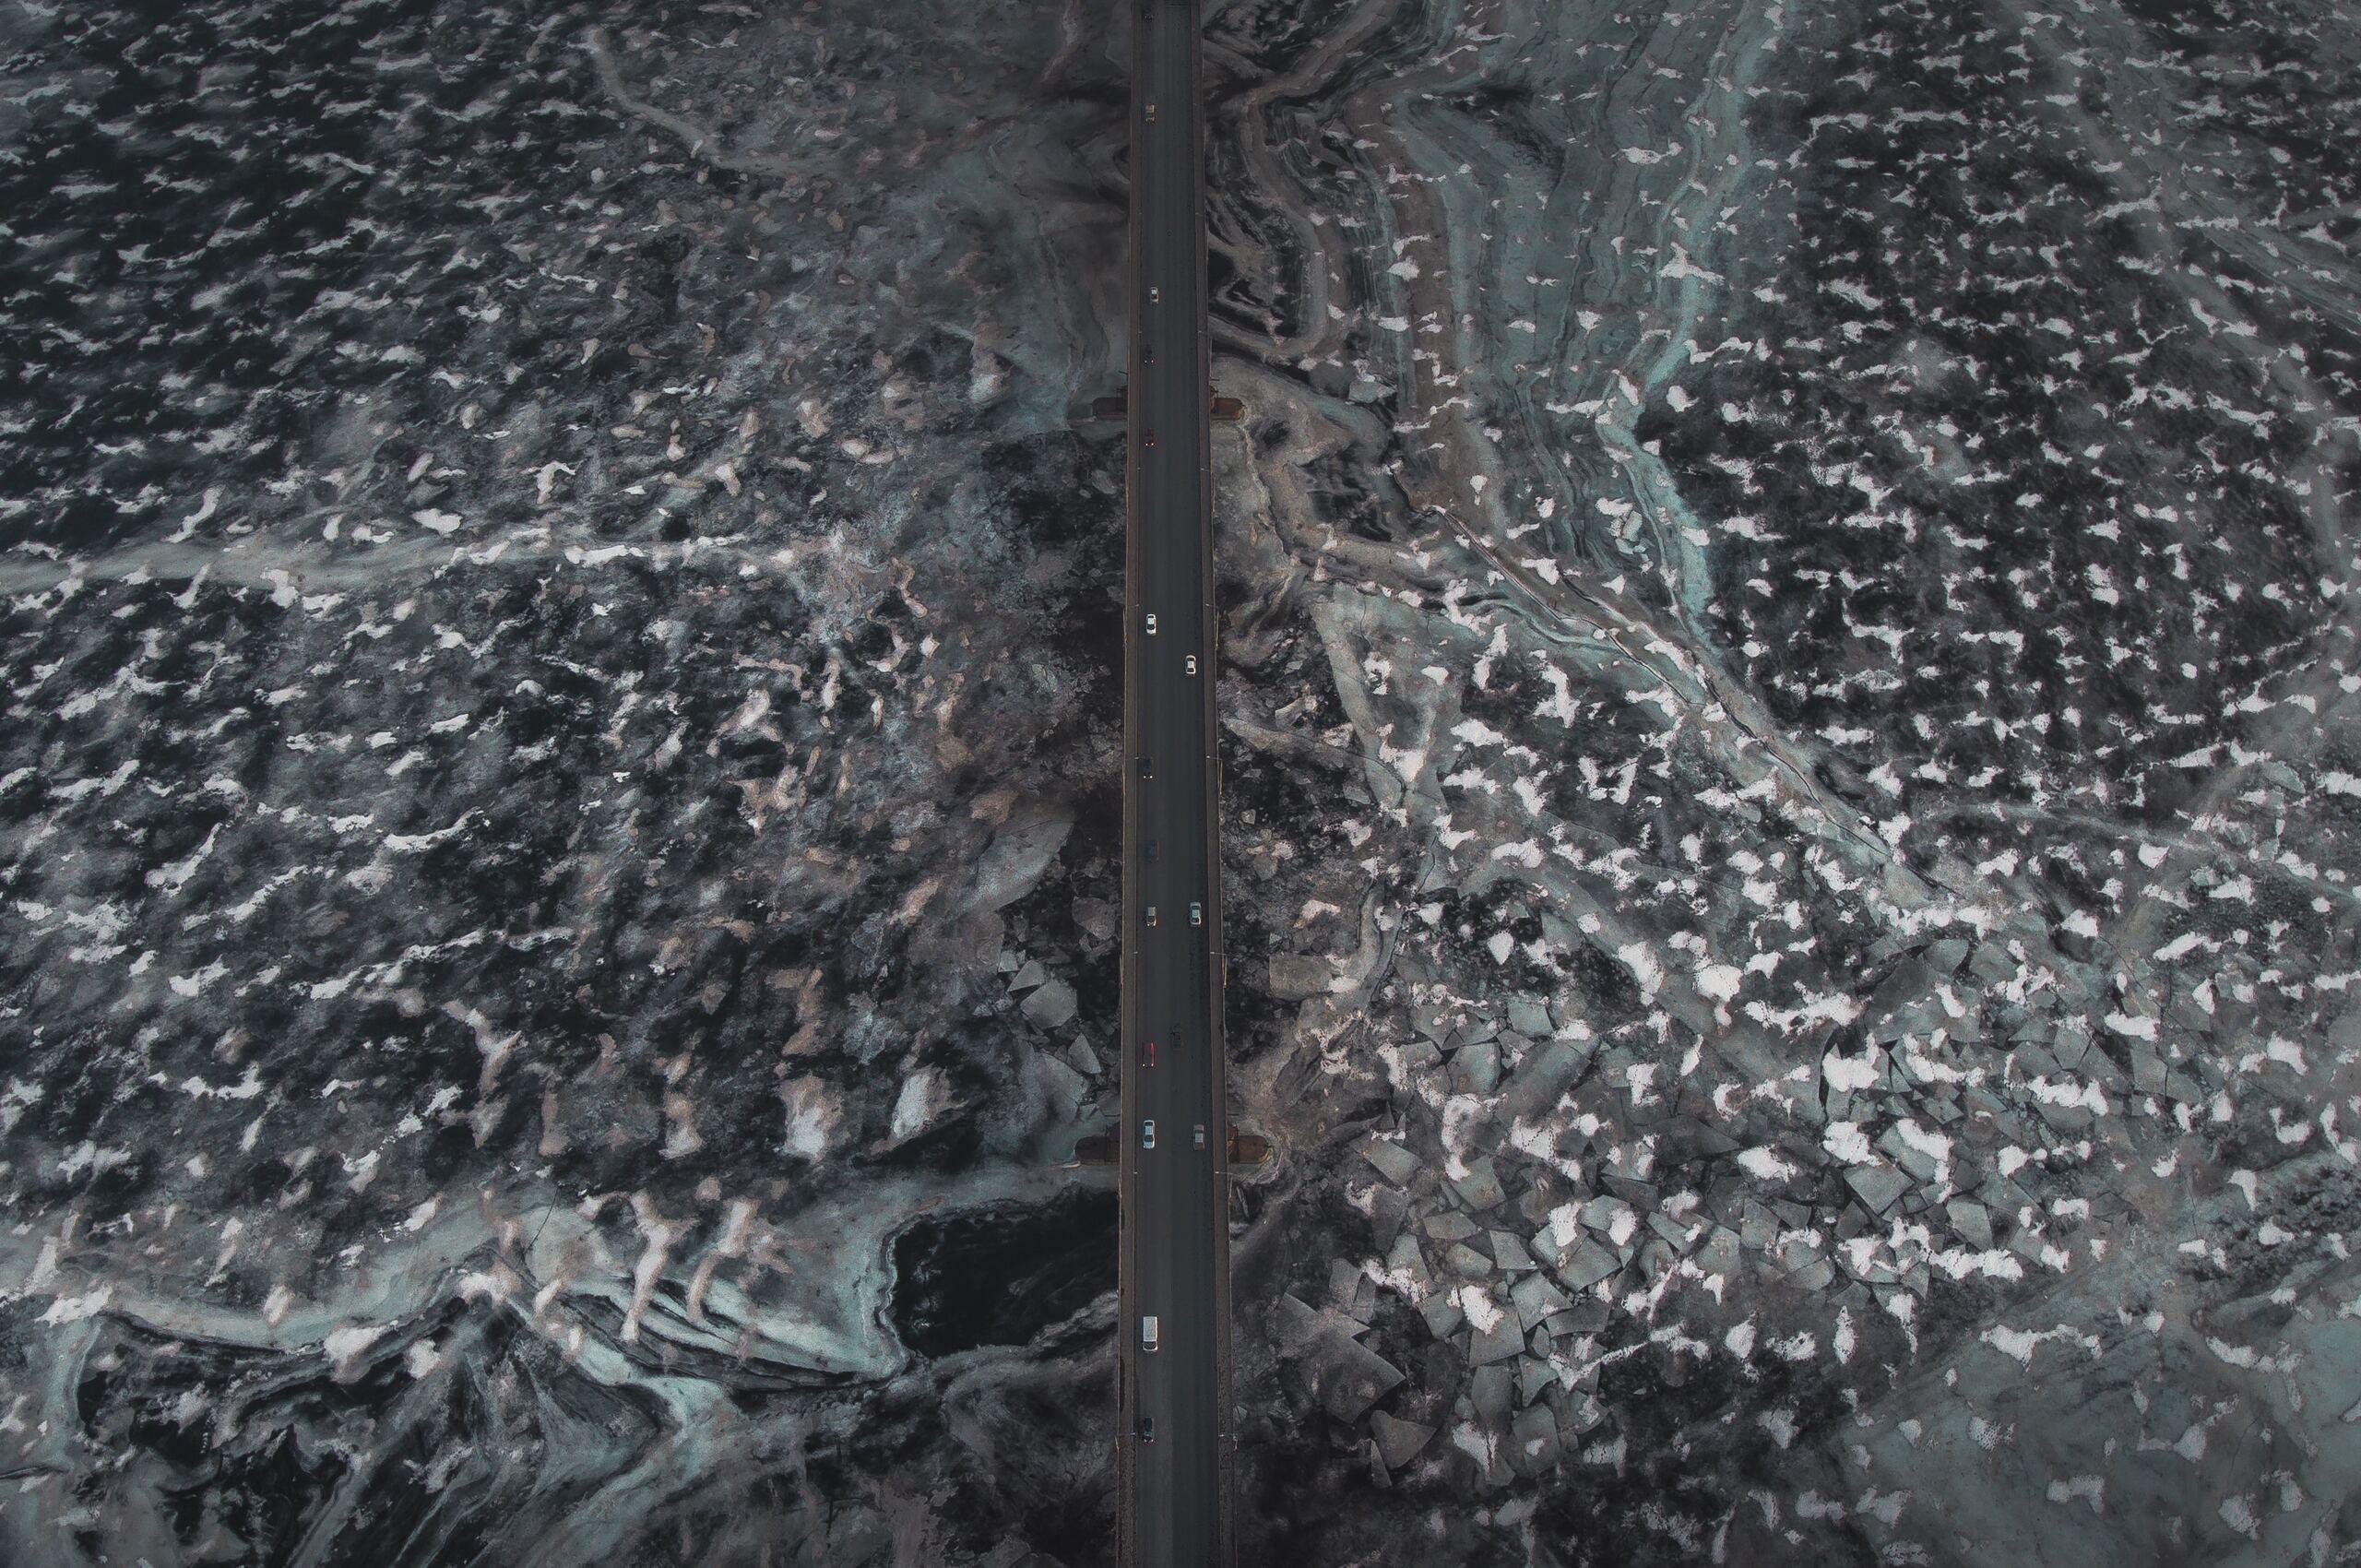 aerial-view-of-road-ice-frozen-4k-np.jpg